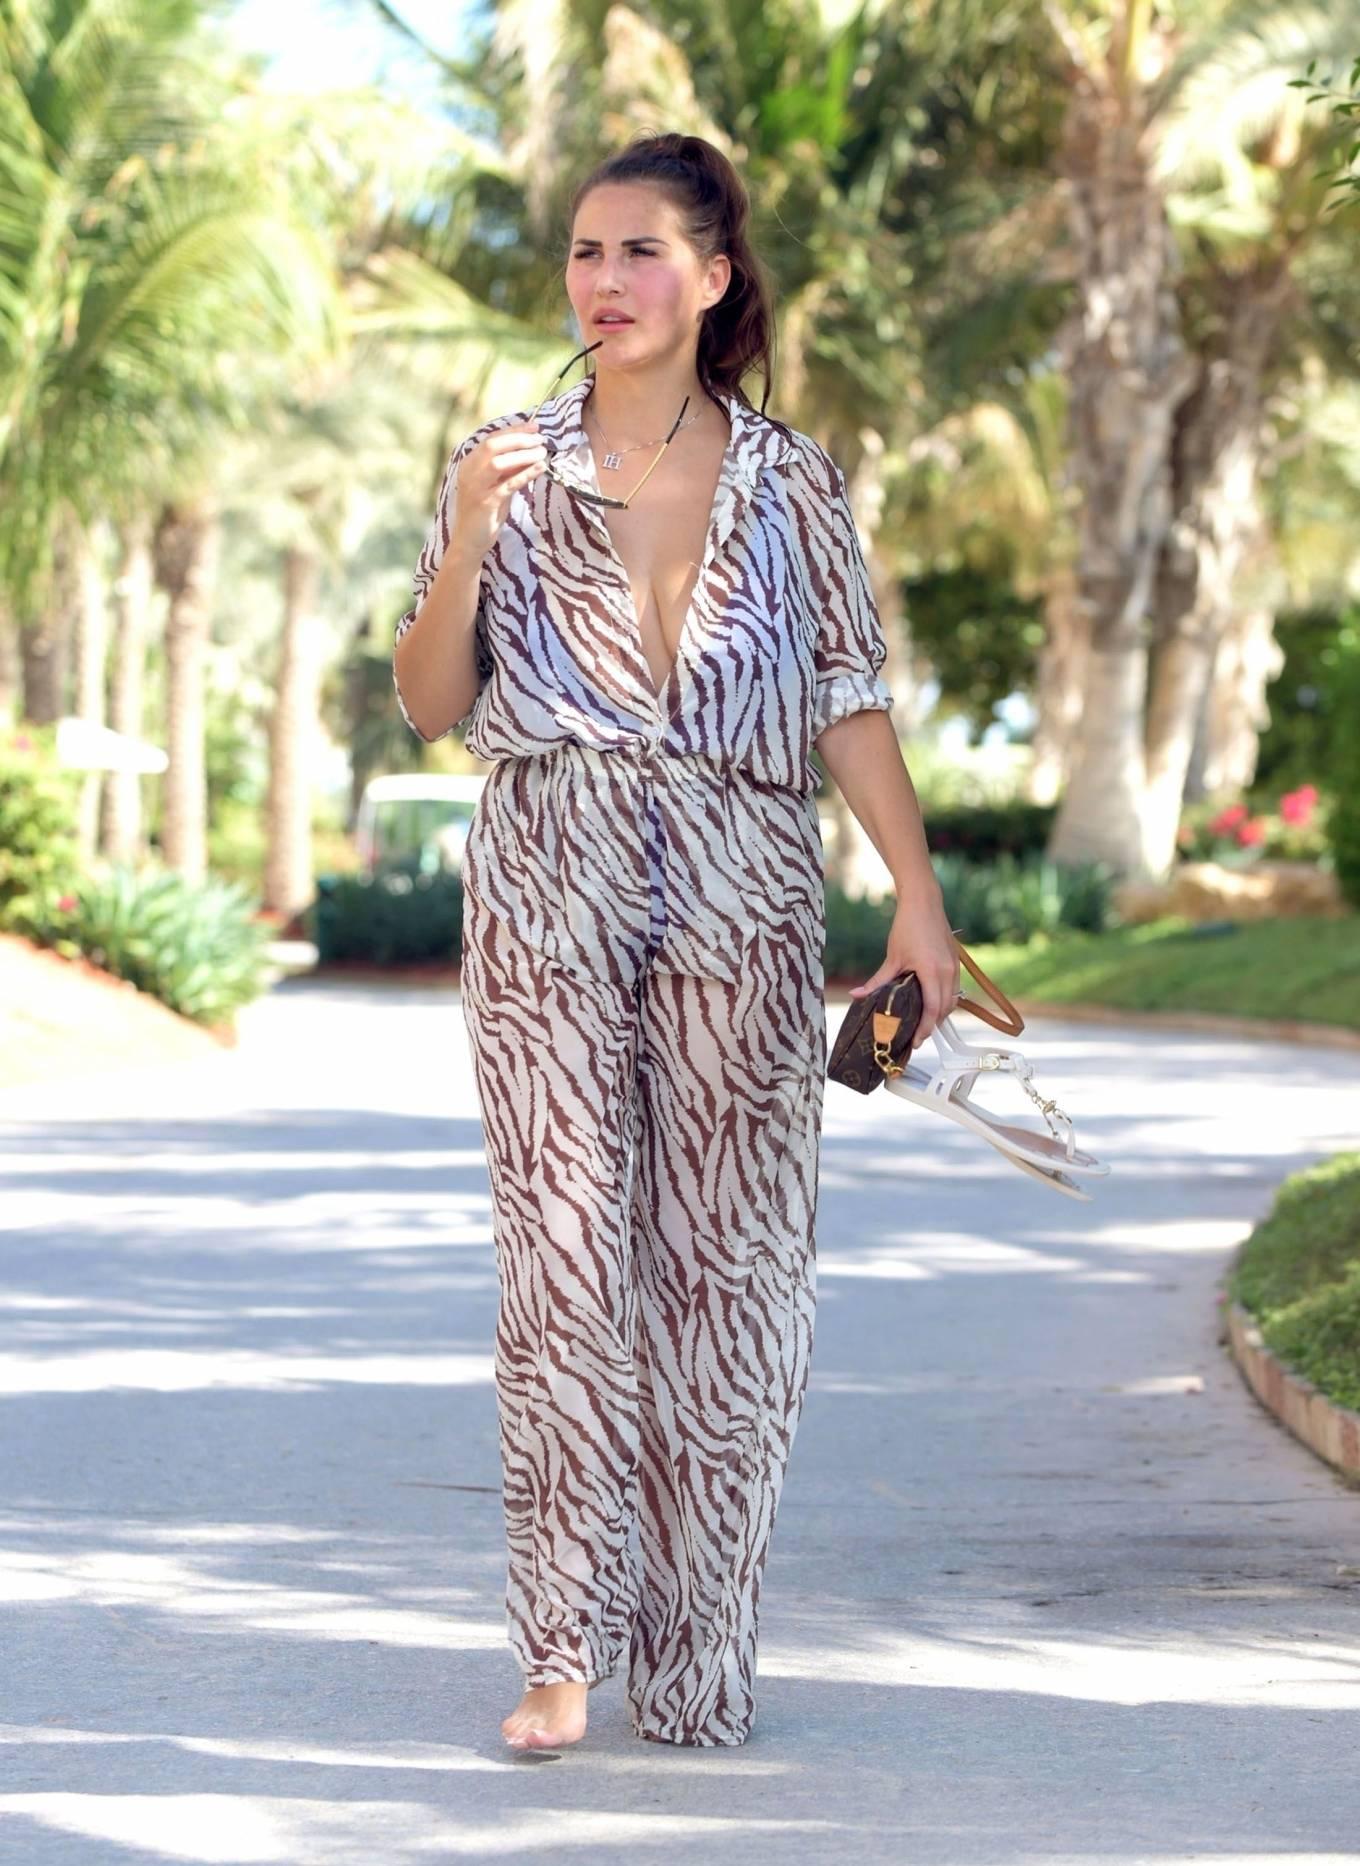 Chloe Goodman 2020 : Chloe Goodman – In a zebra print jumpsuit out on holiday in Dubai-24